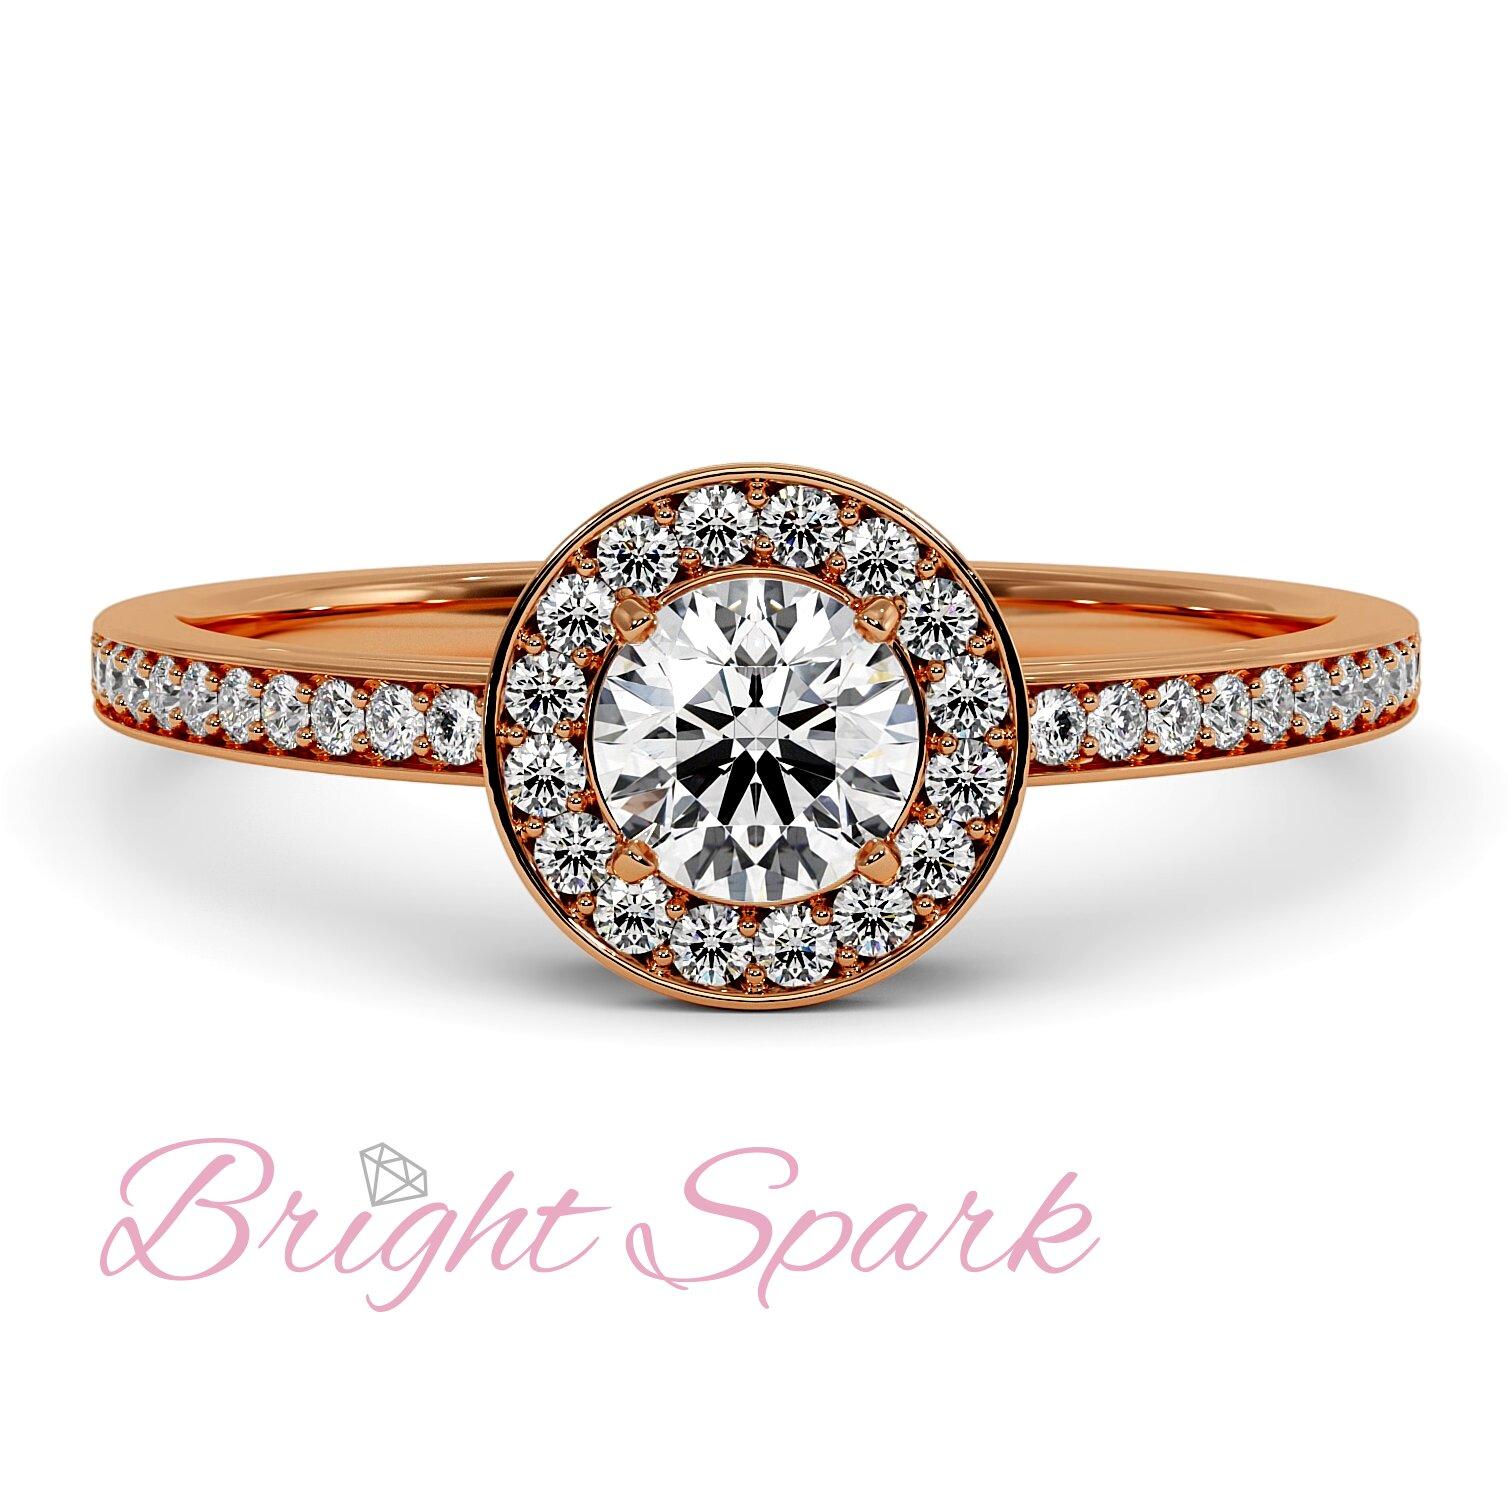 Кольцо розового золота с бриллиантом в глухой оправе 0,4 карата Jessie